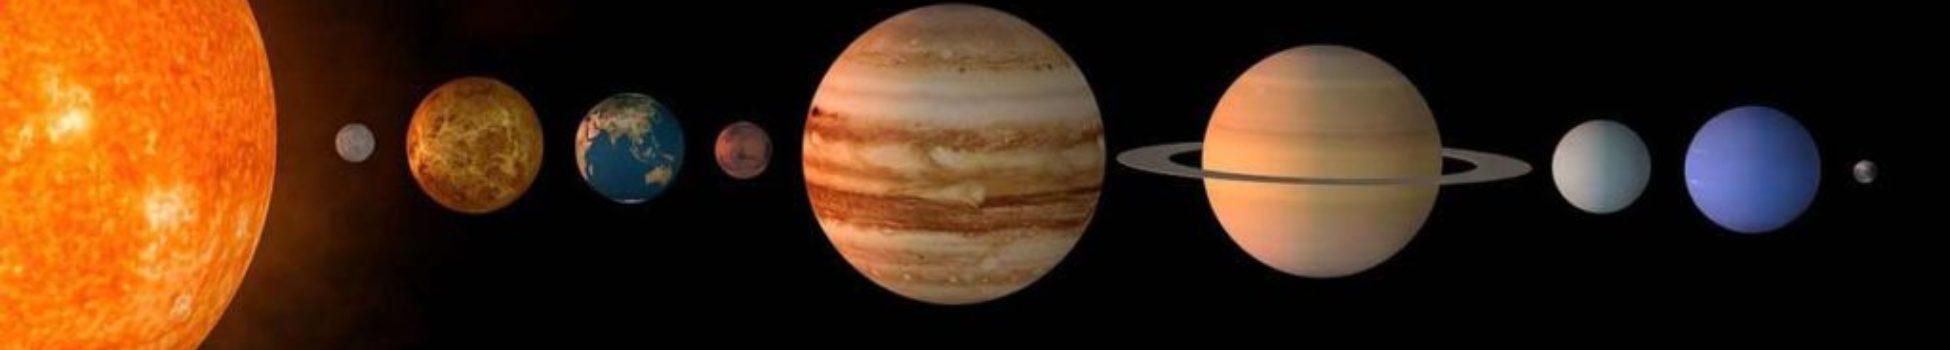 Sistema-solar-miniatura